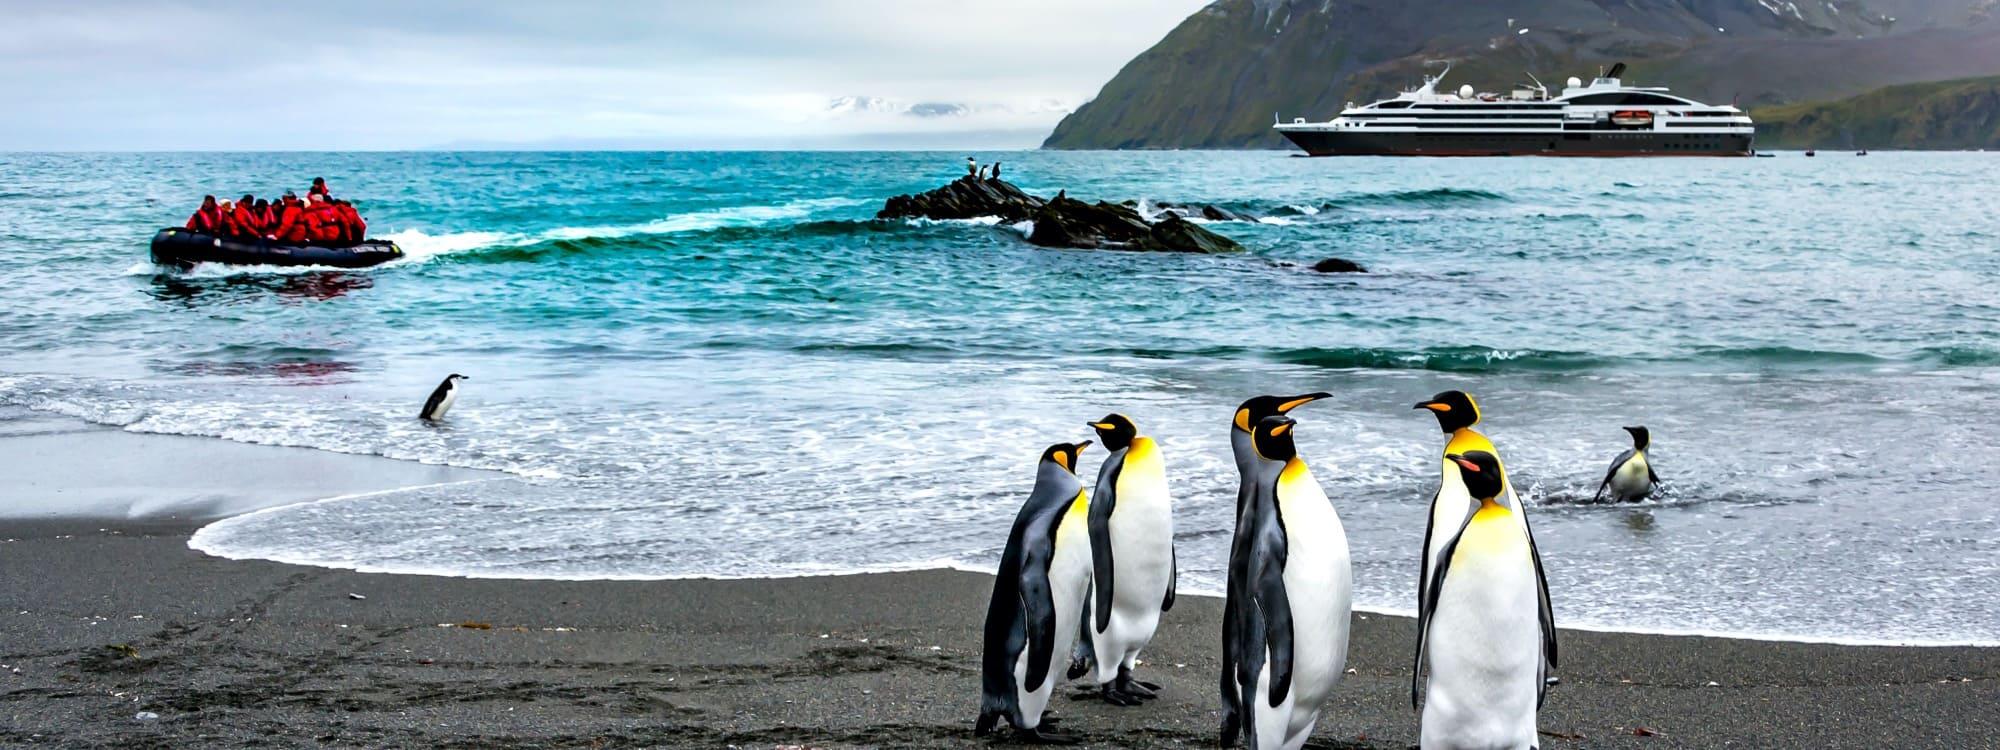 Pinguine bestaunen Ponant-Passagiere im Zodiac